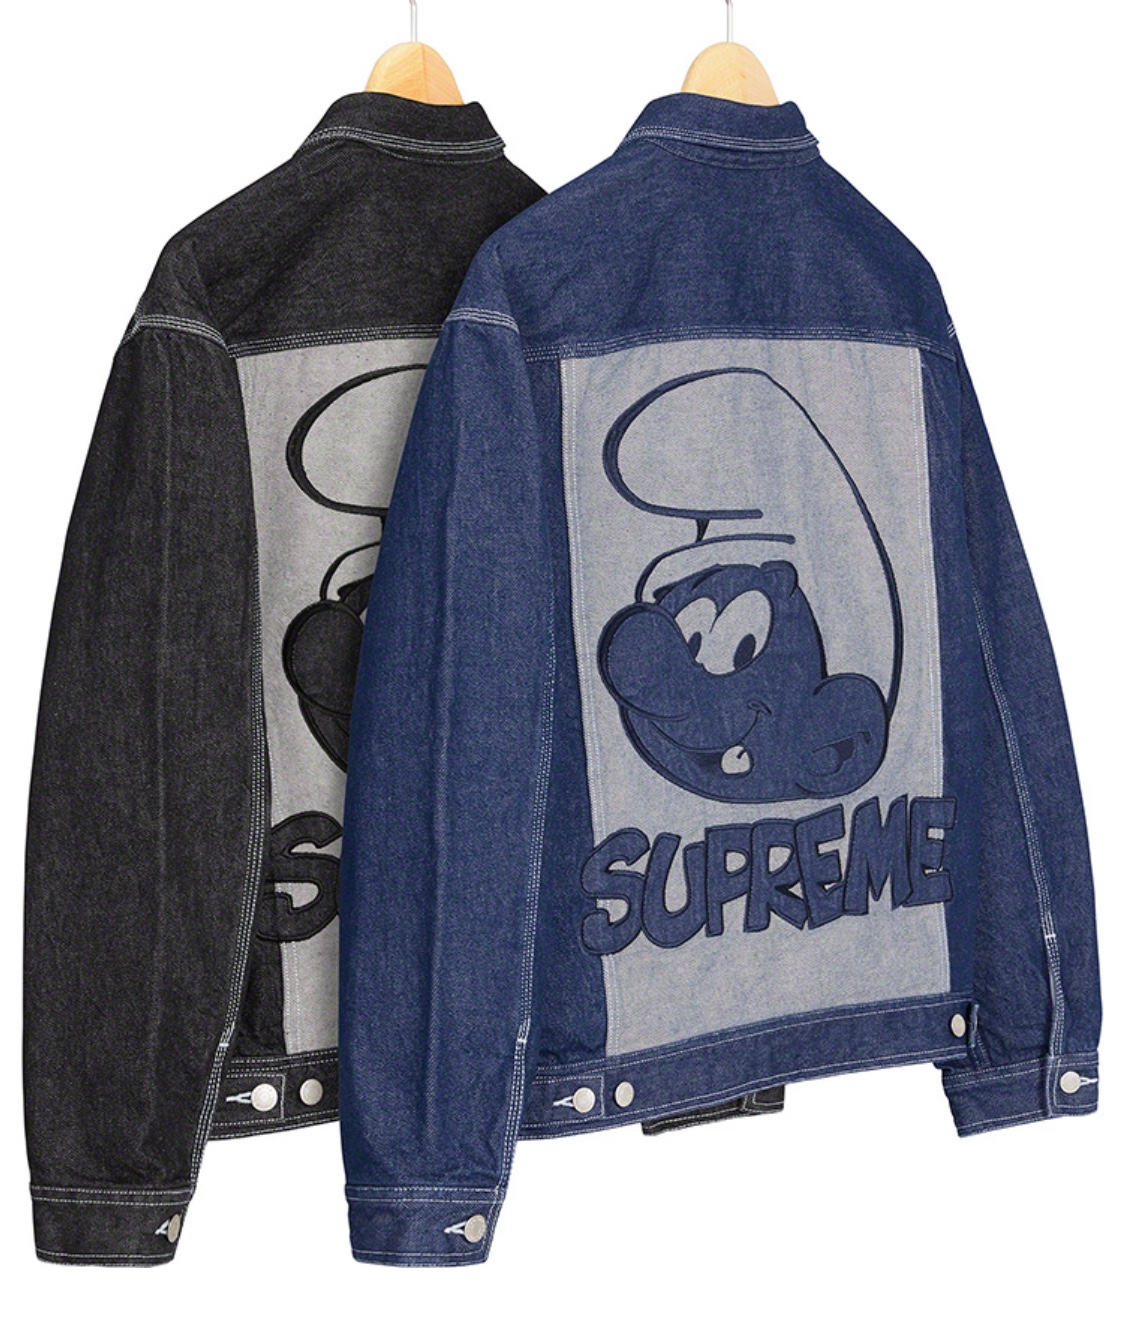 Supreme x The Smurfs denim jacket